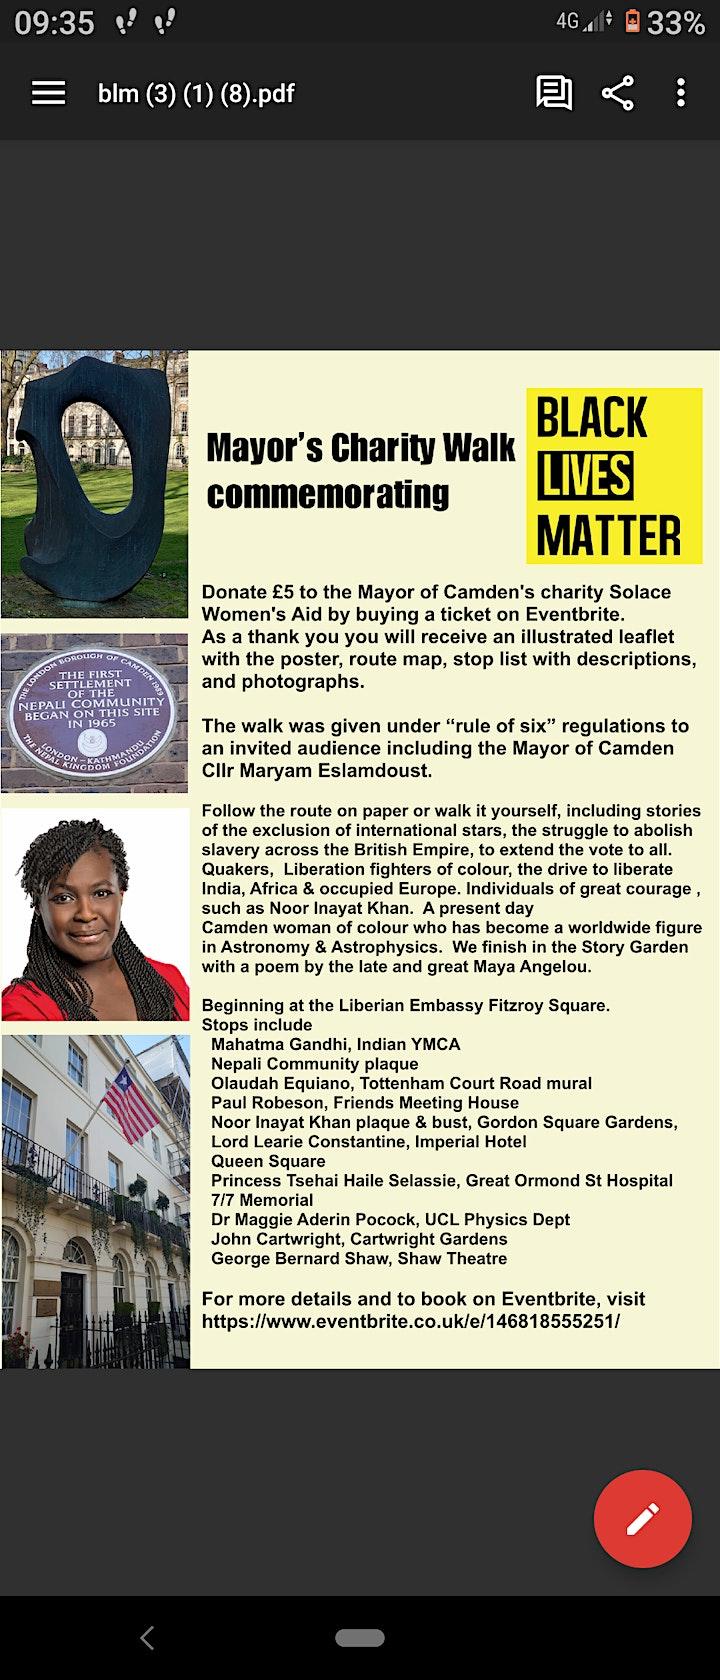 Black History Month Walks In Camden Borough image